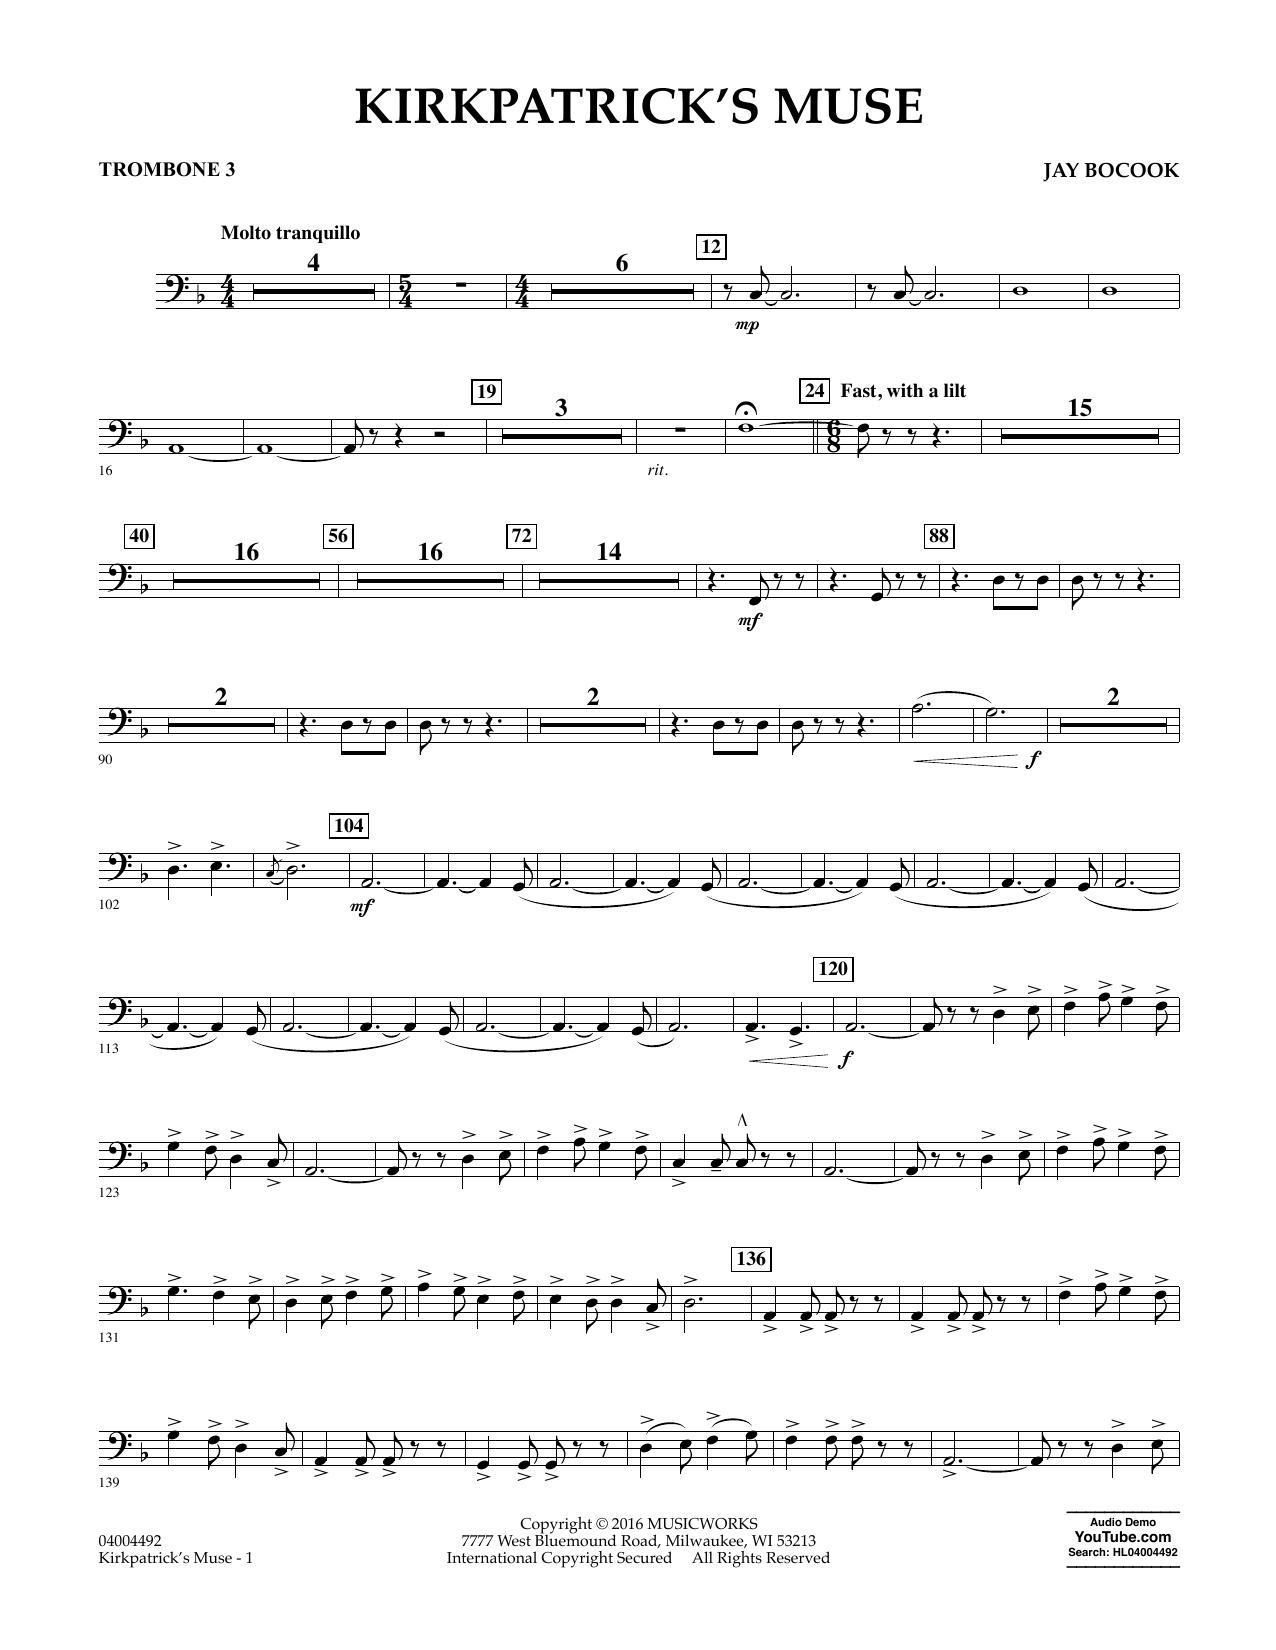 Kirkpatrick's Muse - Trombone 3